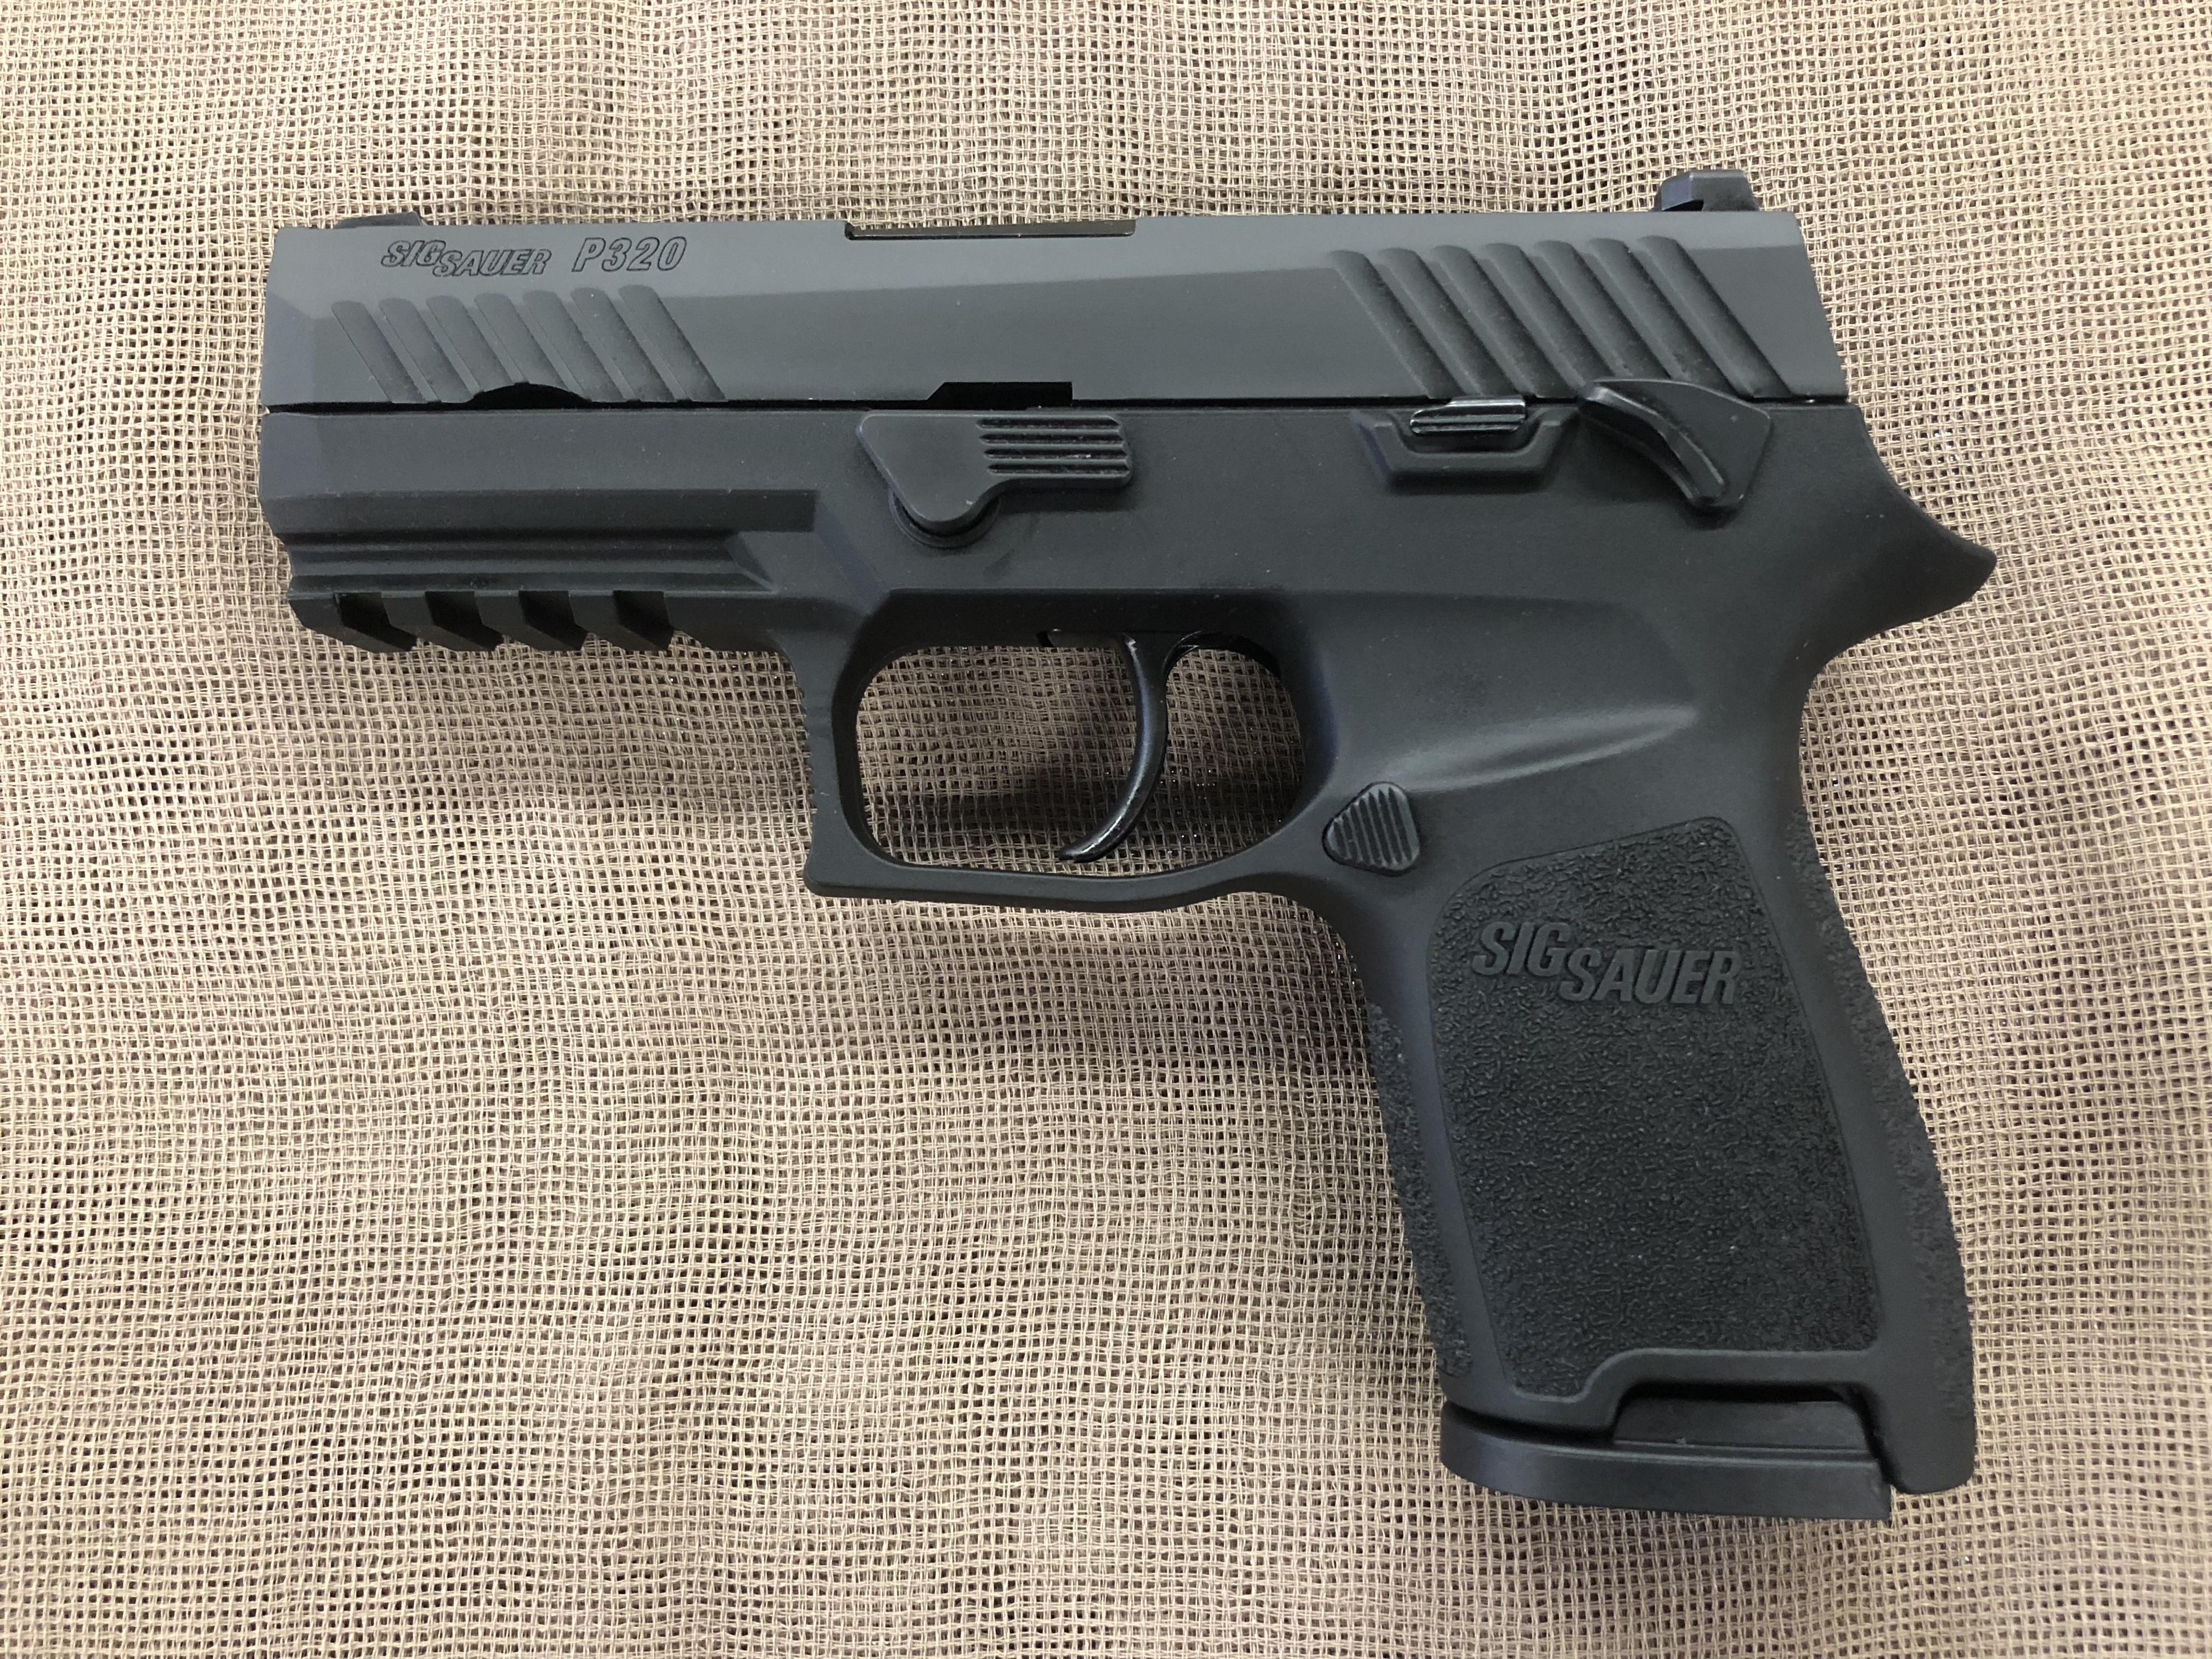 Sig Sauer P320 Compact 9mm Night Sighs external safety